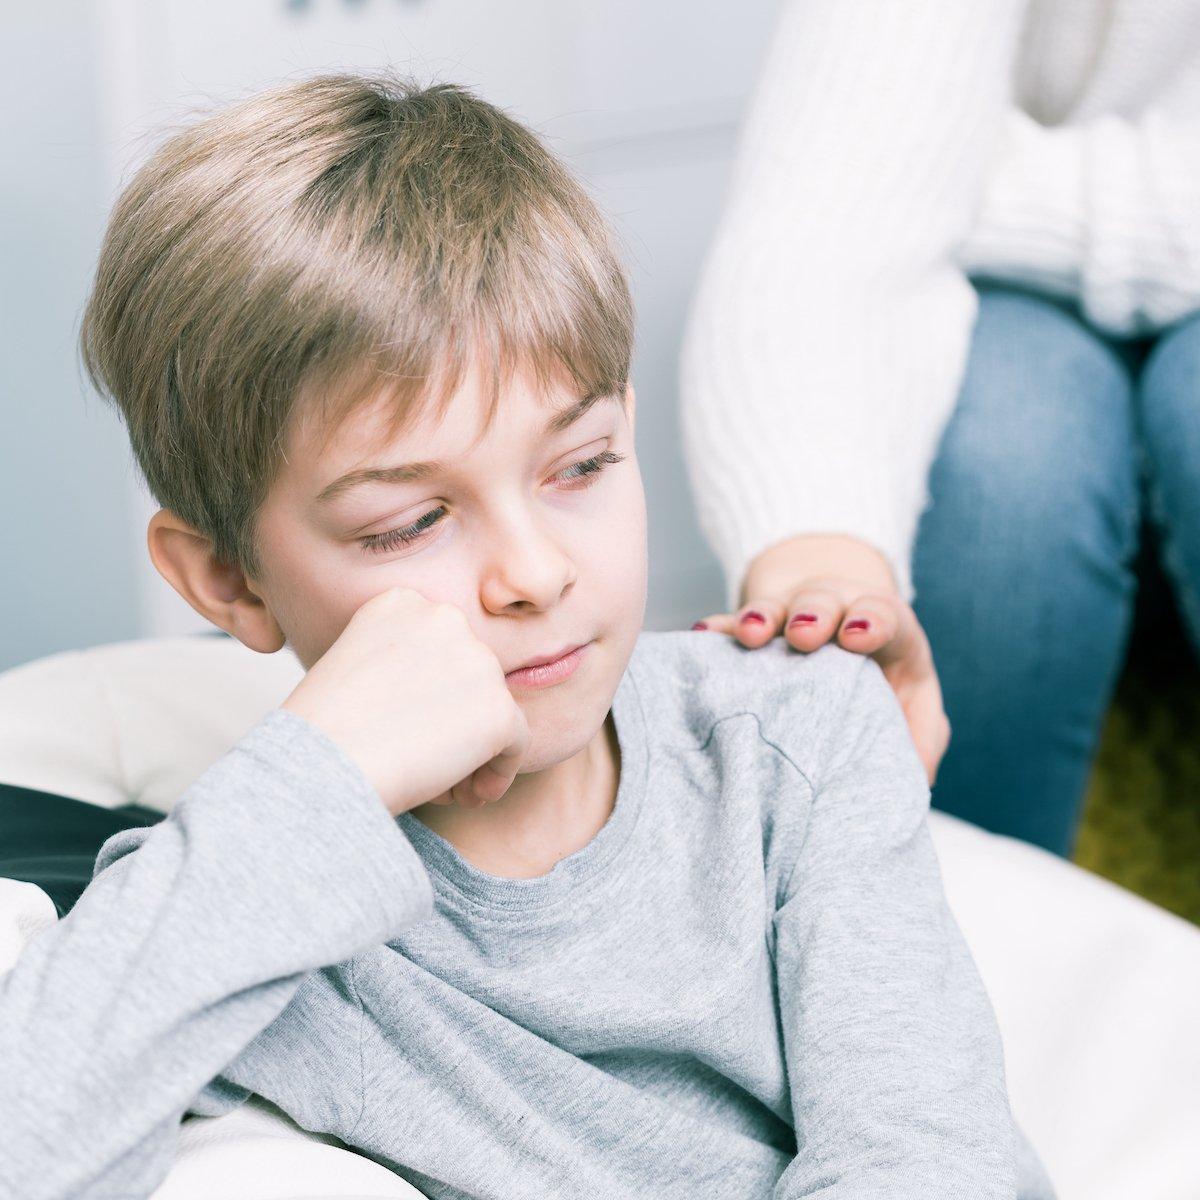 Sad boy in need of child therapy, New City, NY